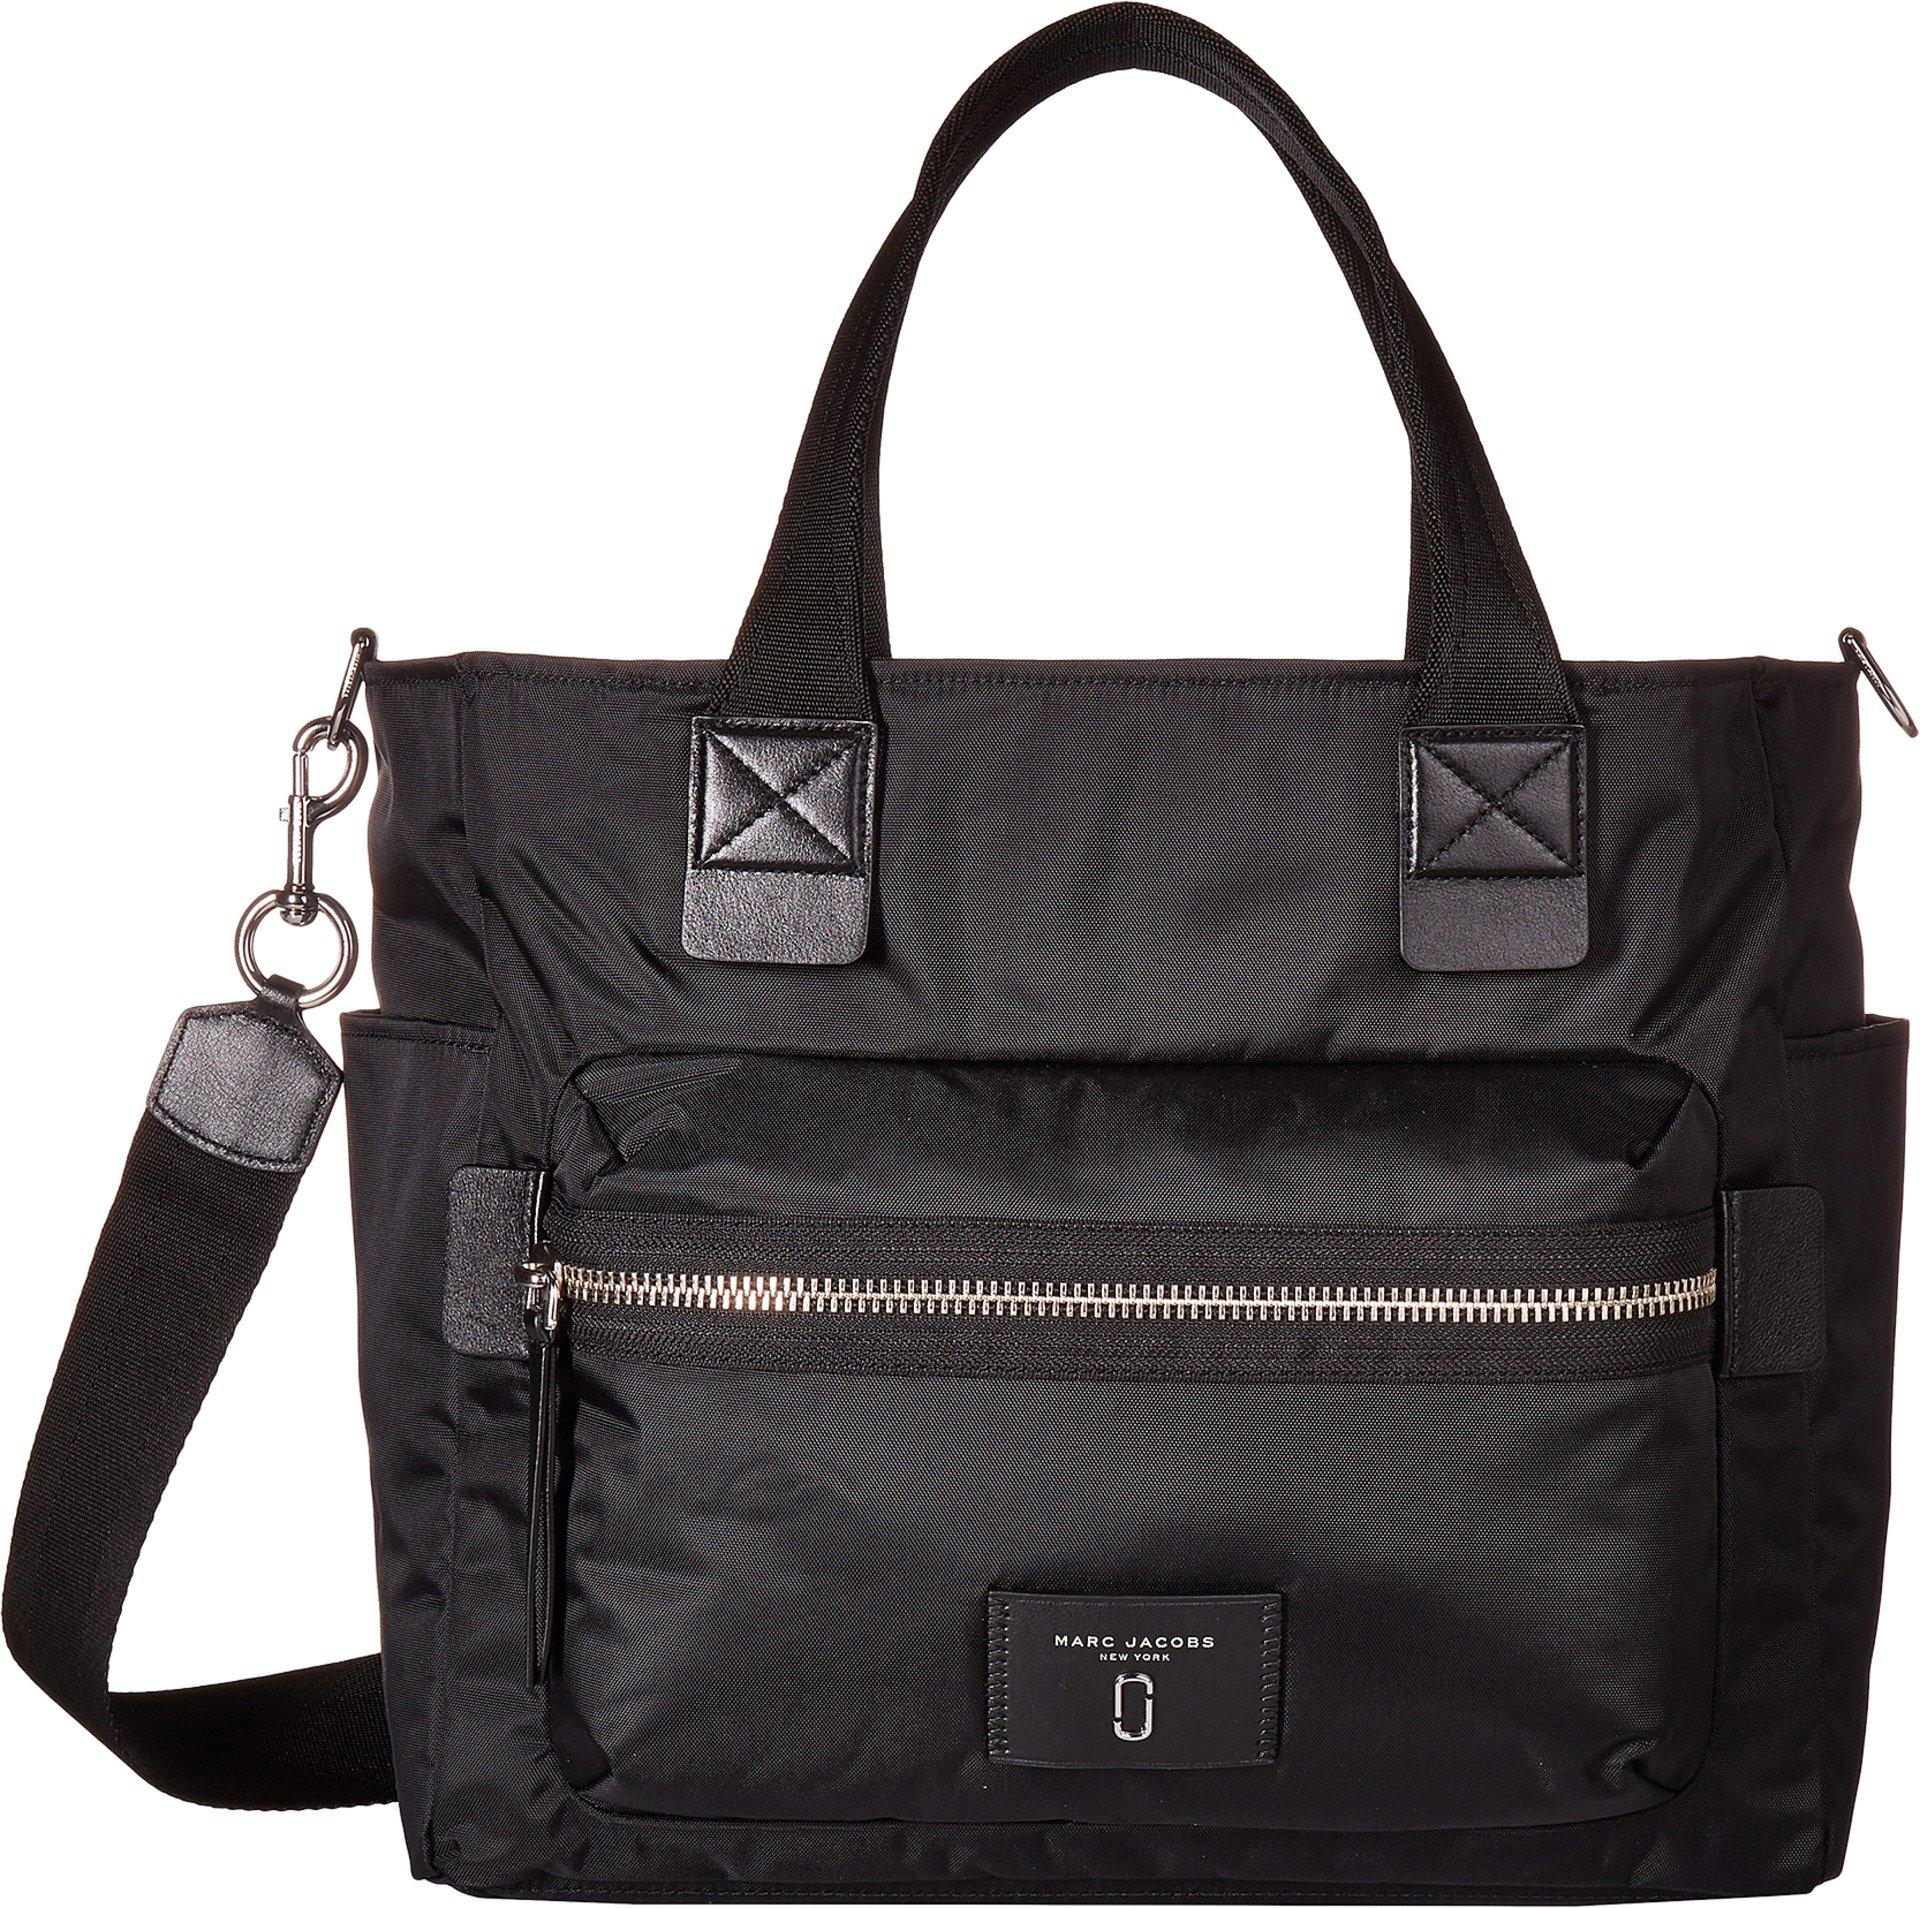 Marc Jacobs Women's Nylon Biker Baby Bag, Black, One Size